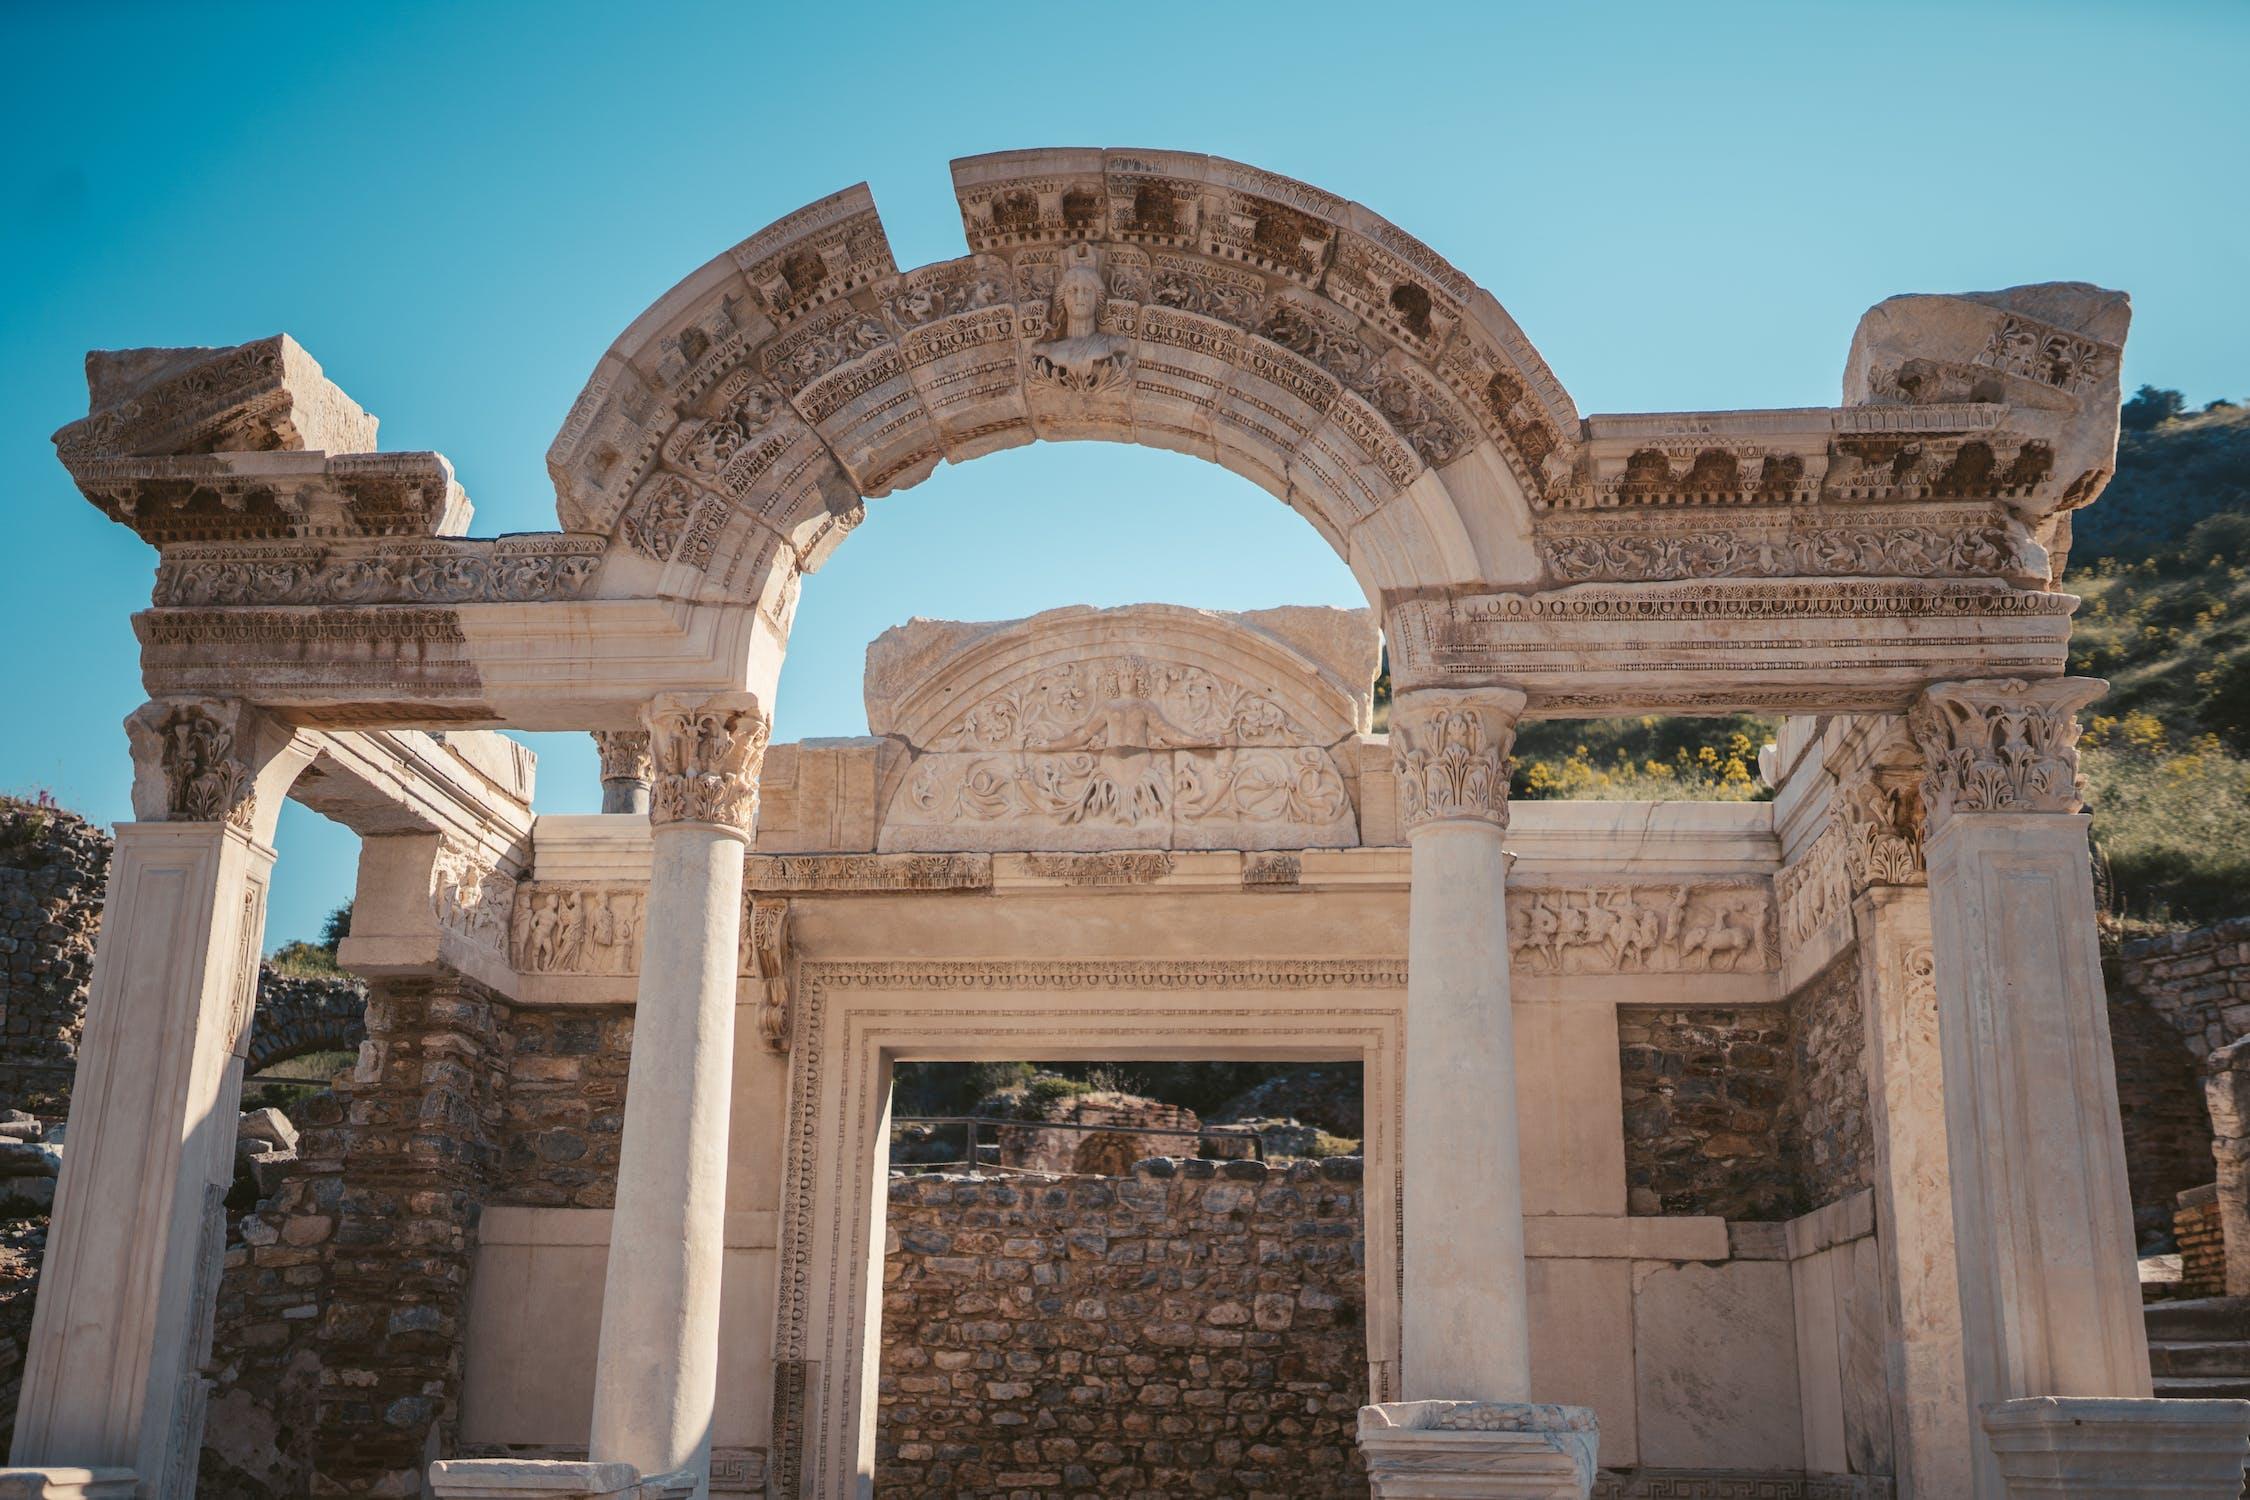 Ephesus is an ancient city in Turkey's Central Aegean region